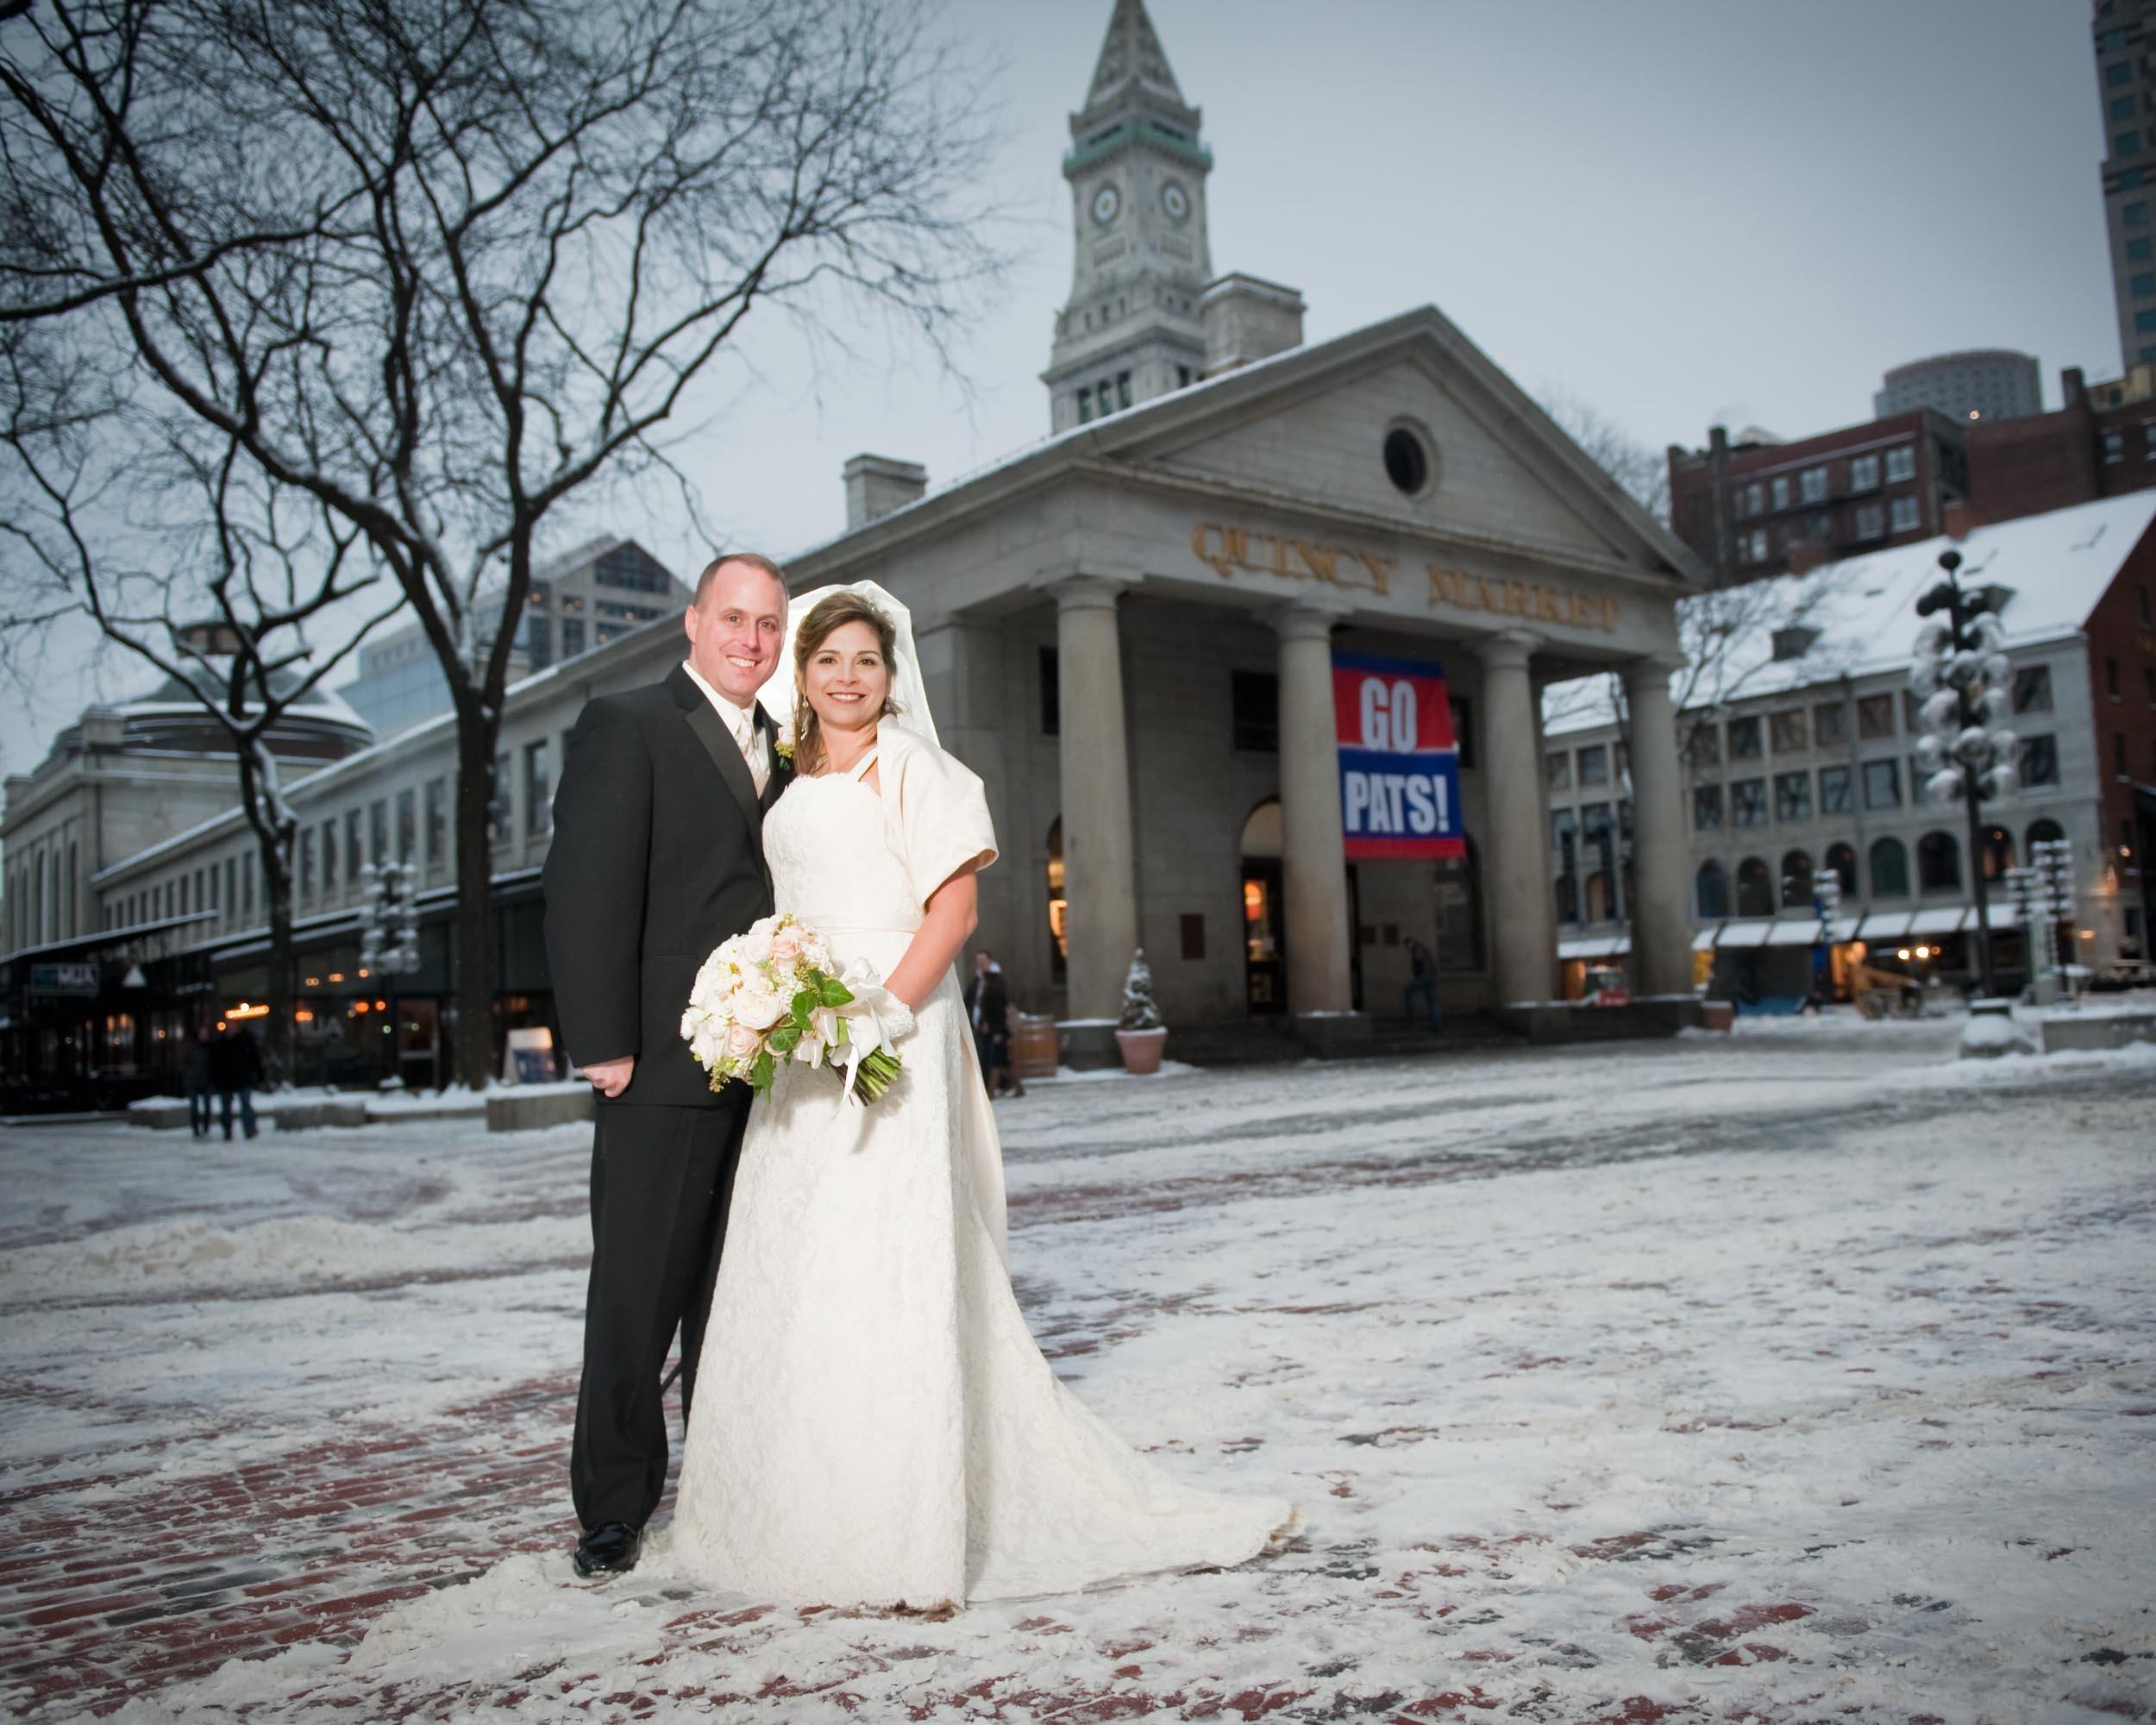 Wedding34Whittemore-100-2.jpg